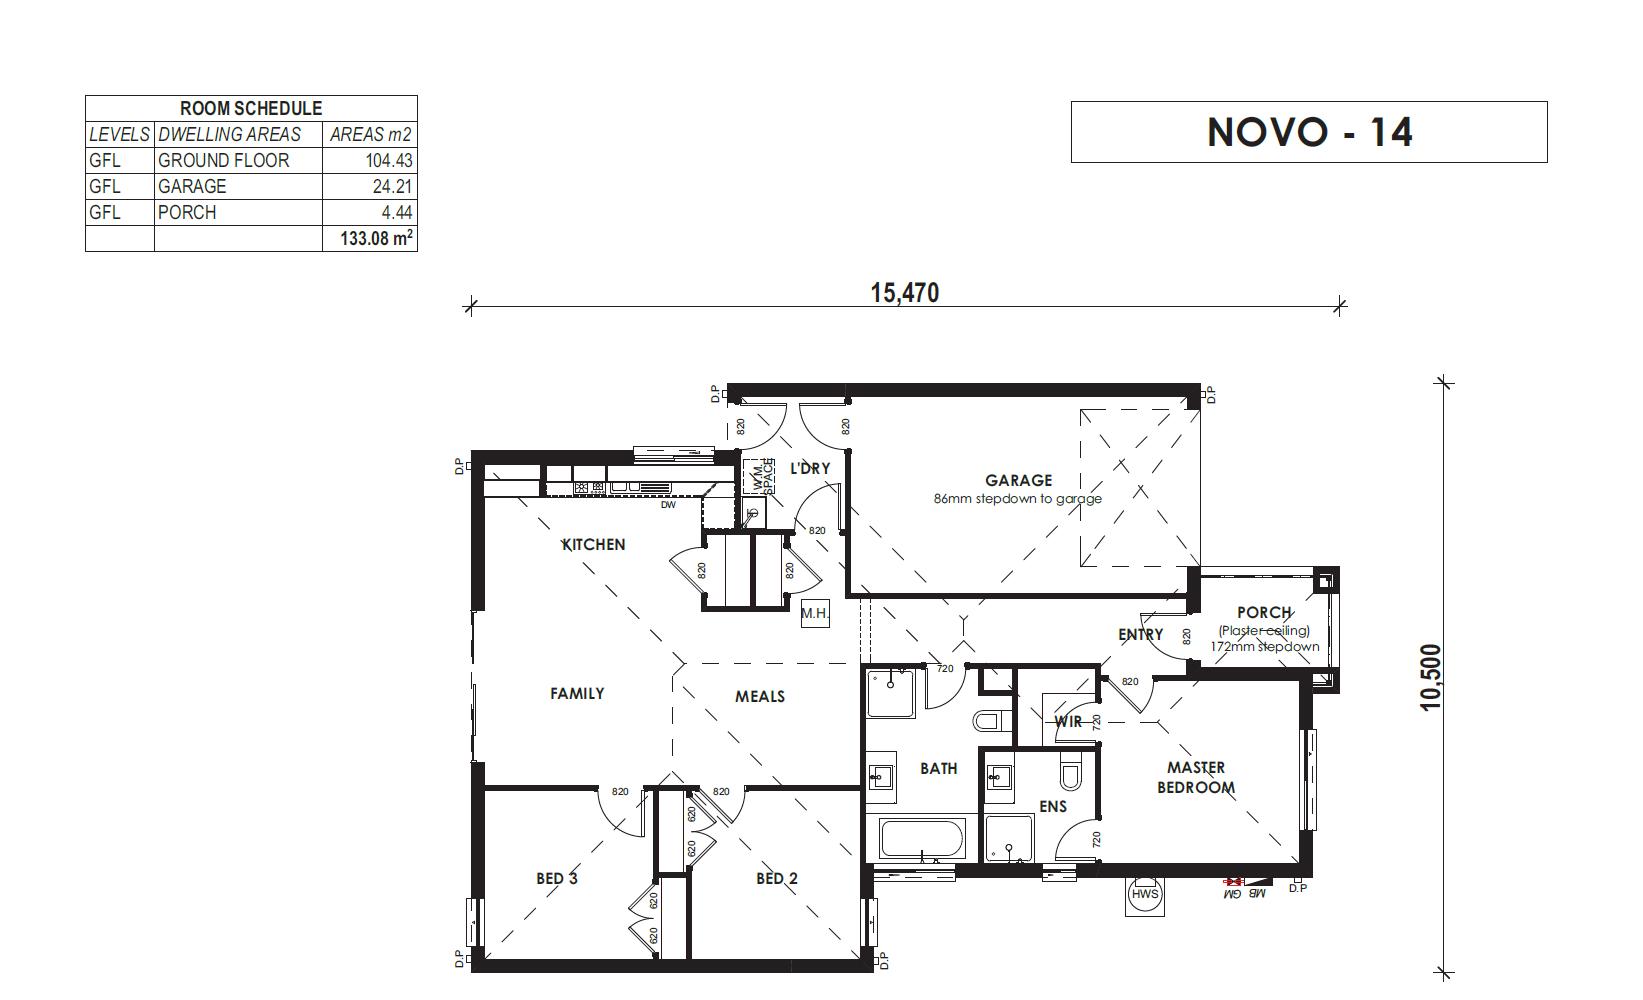 Lot 731 - Mambourin - Novo 14_Whitlam (002)